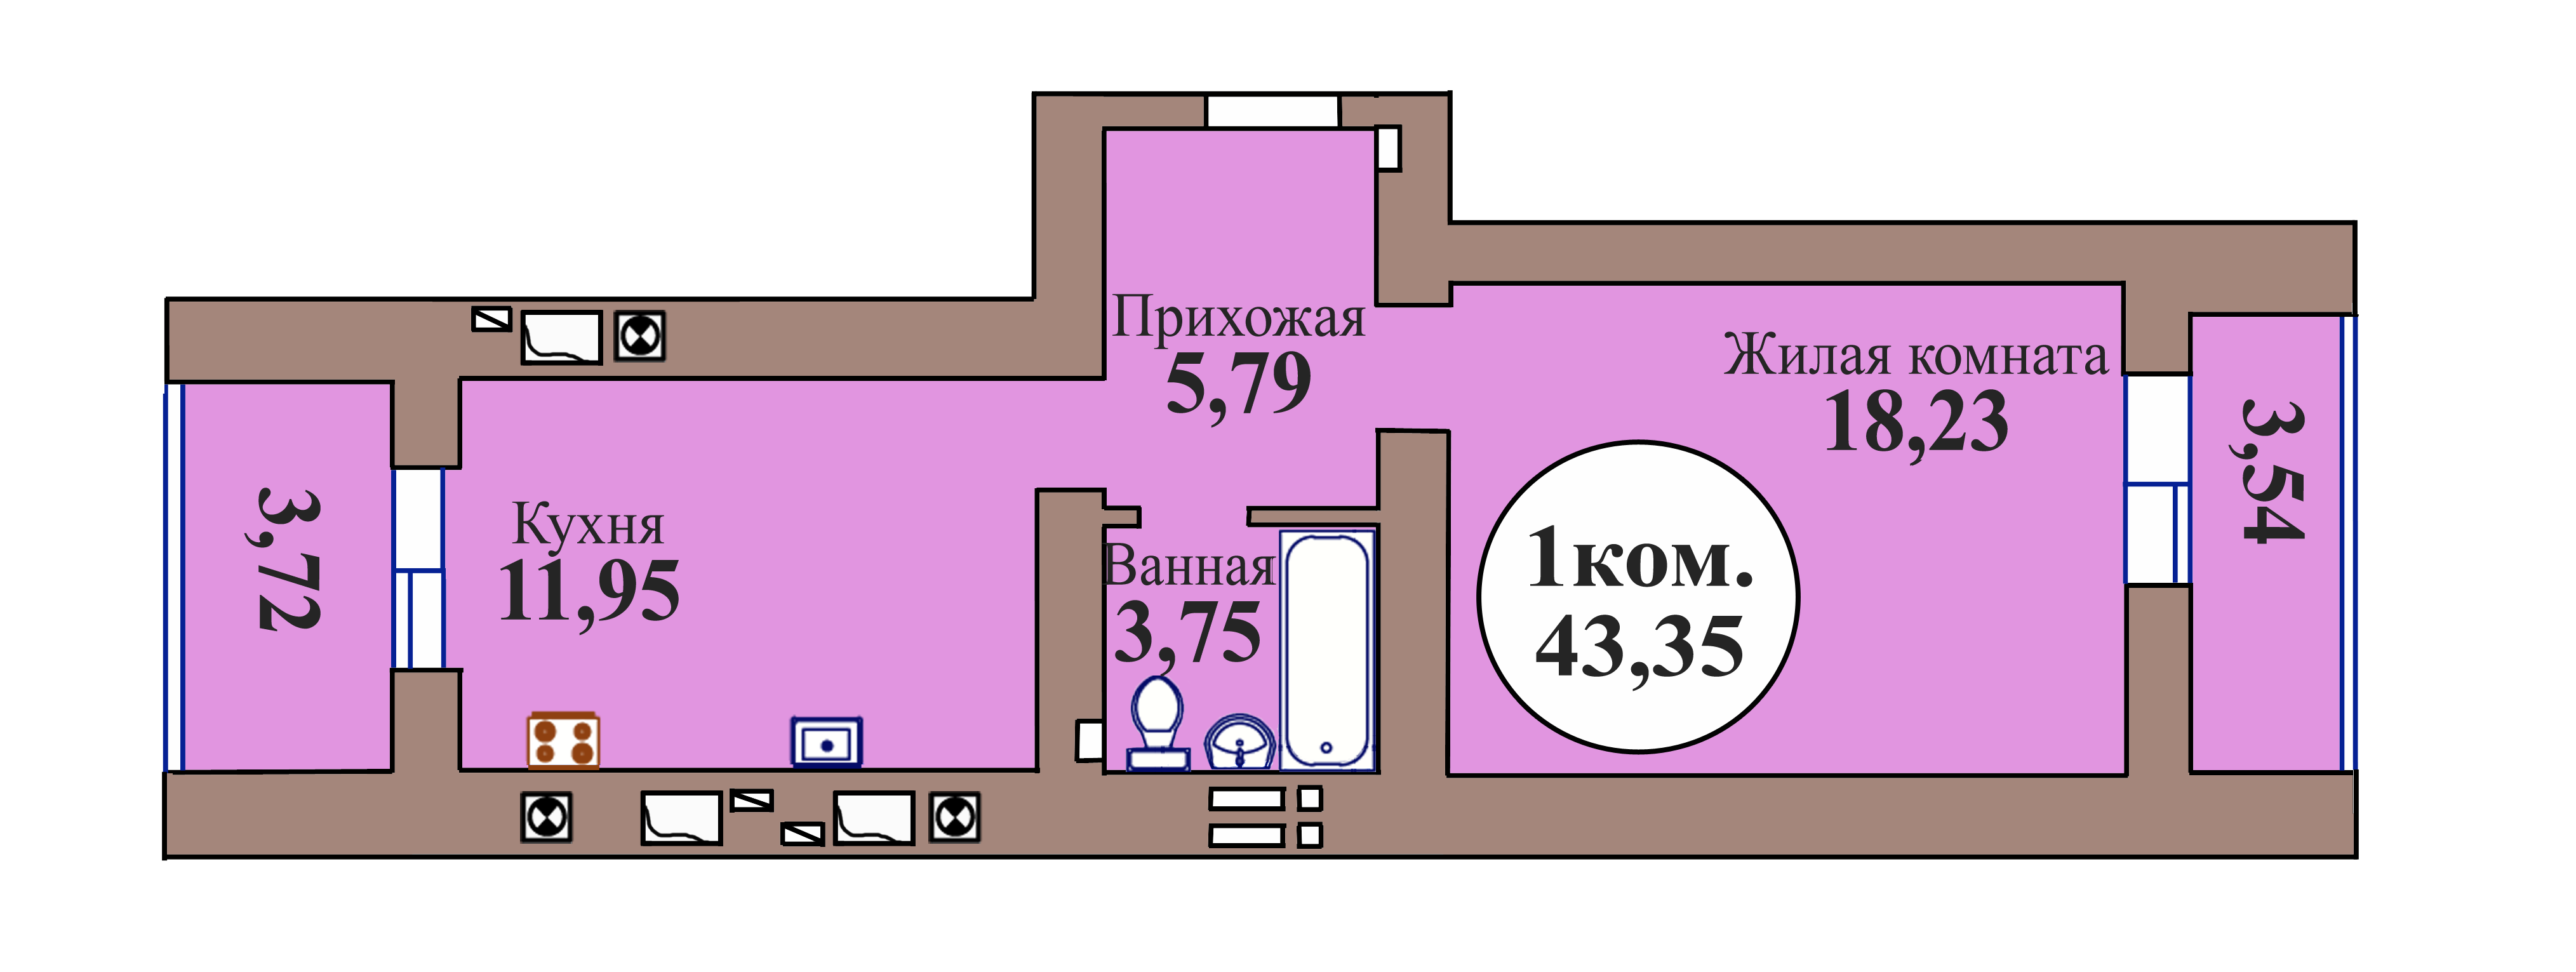 1-комн. кв. по пер. Калининградский, 5 кв. 82 в Калининграде